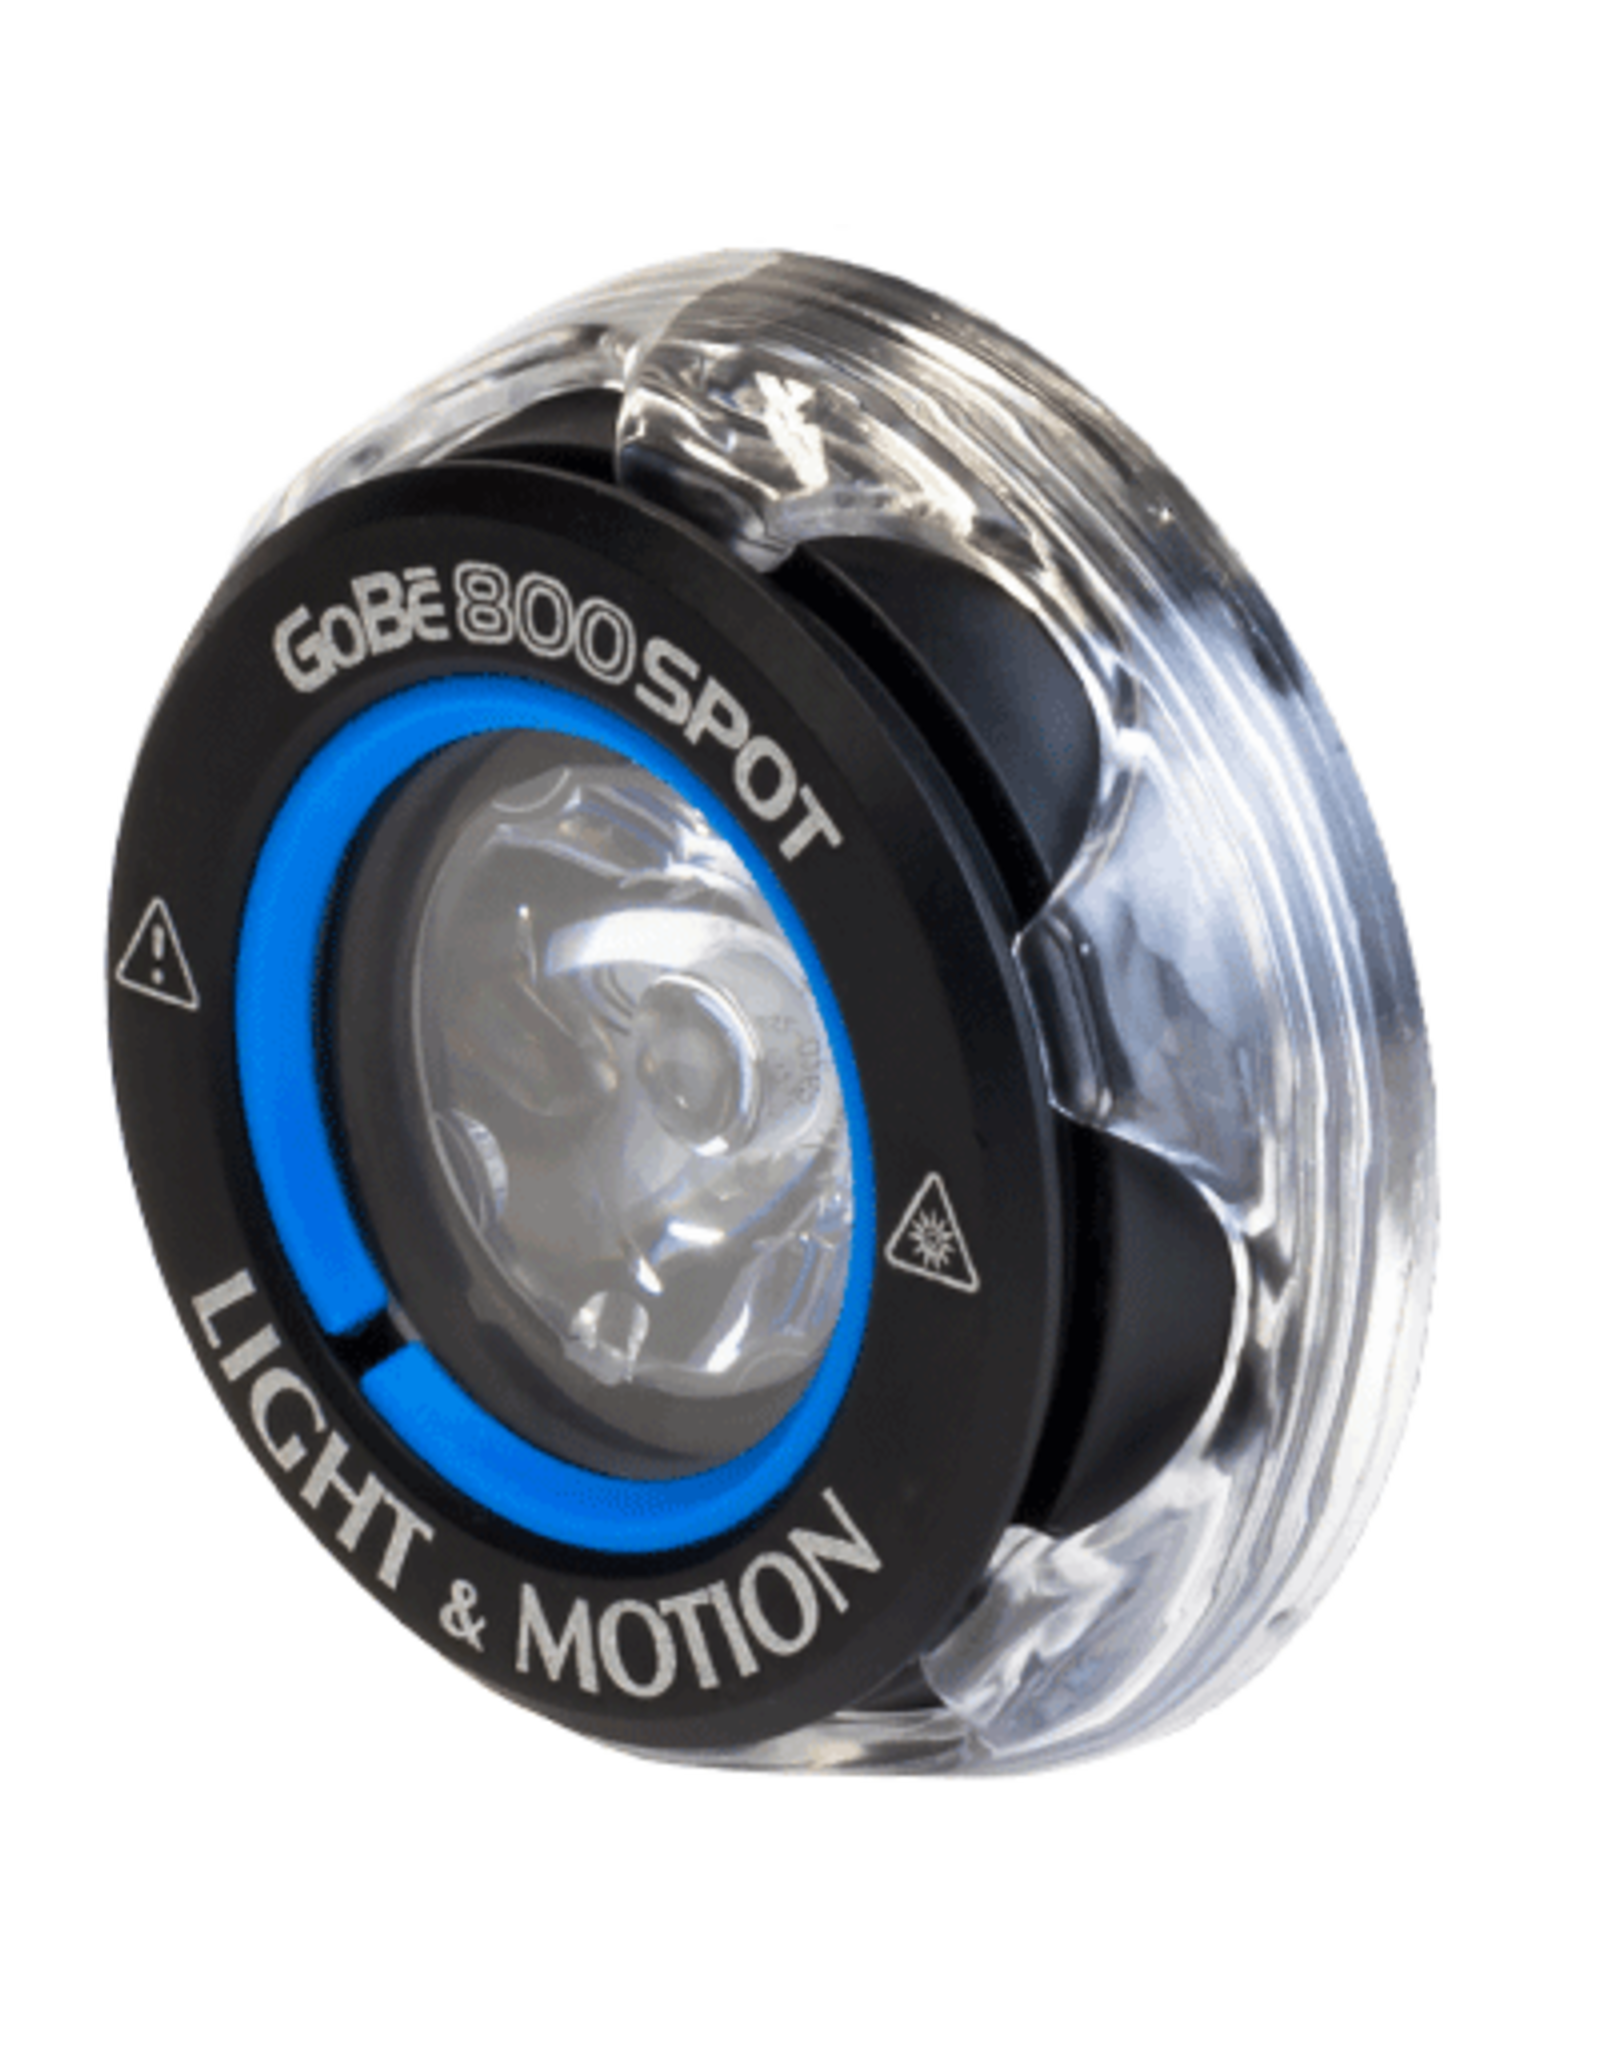 Light & Motion GoBe 800 Spot Head